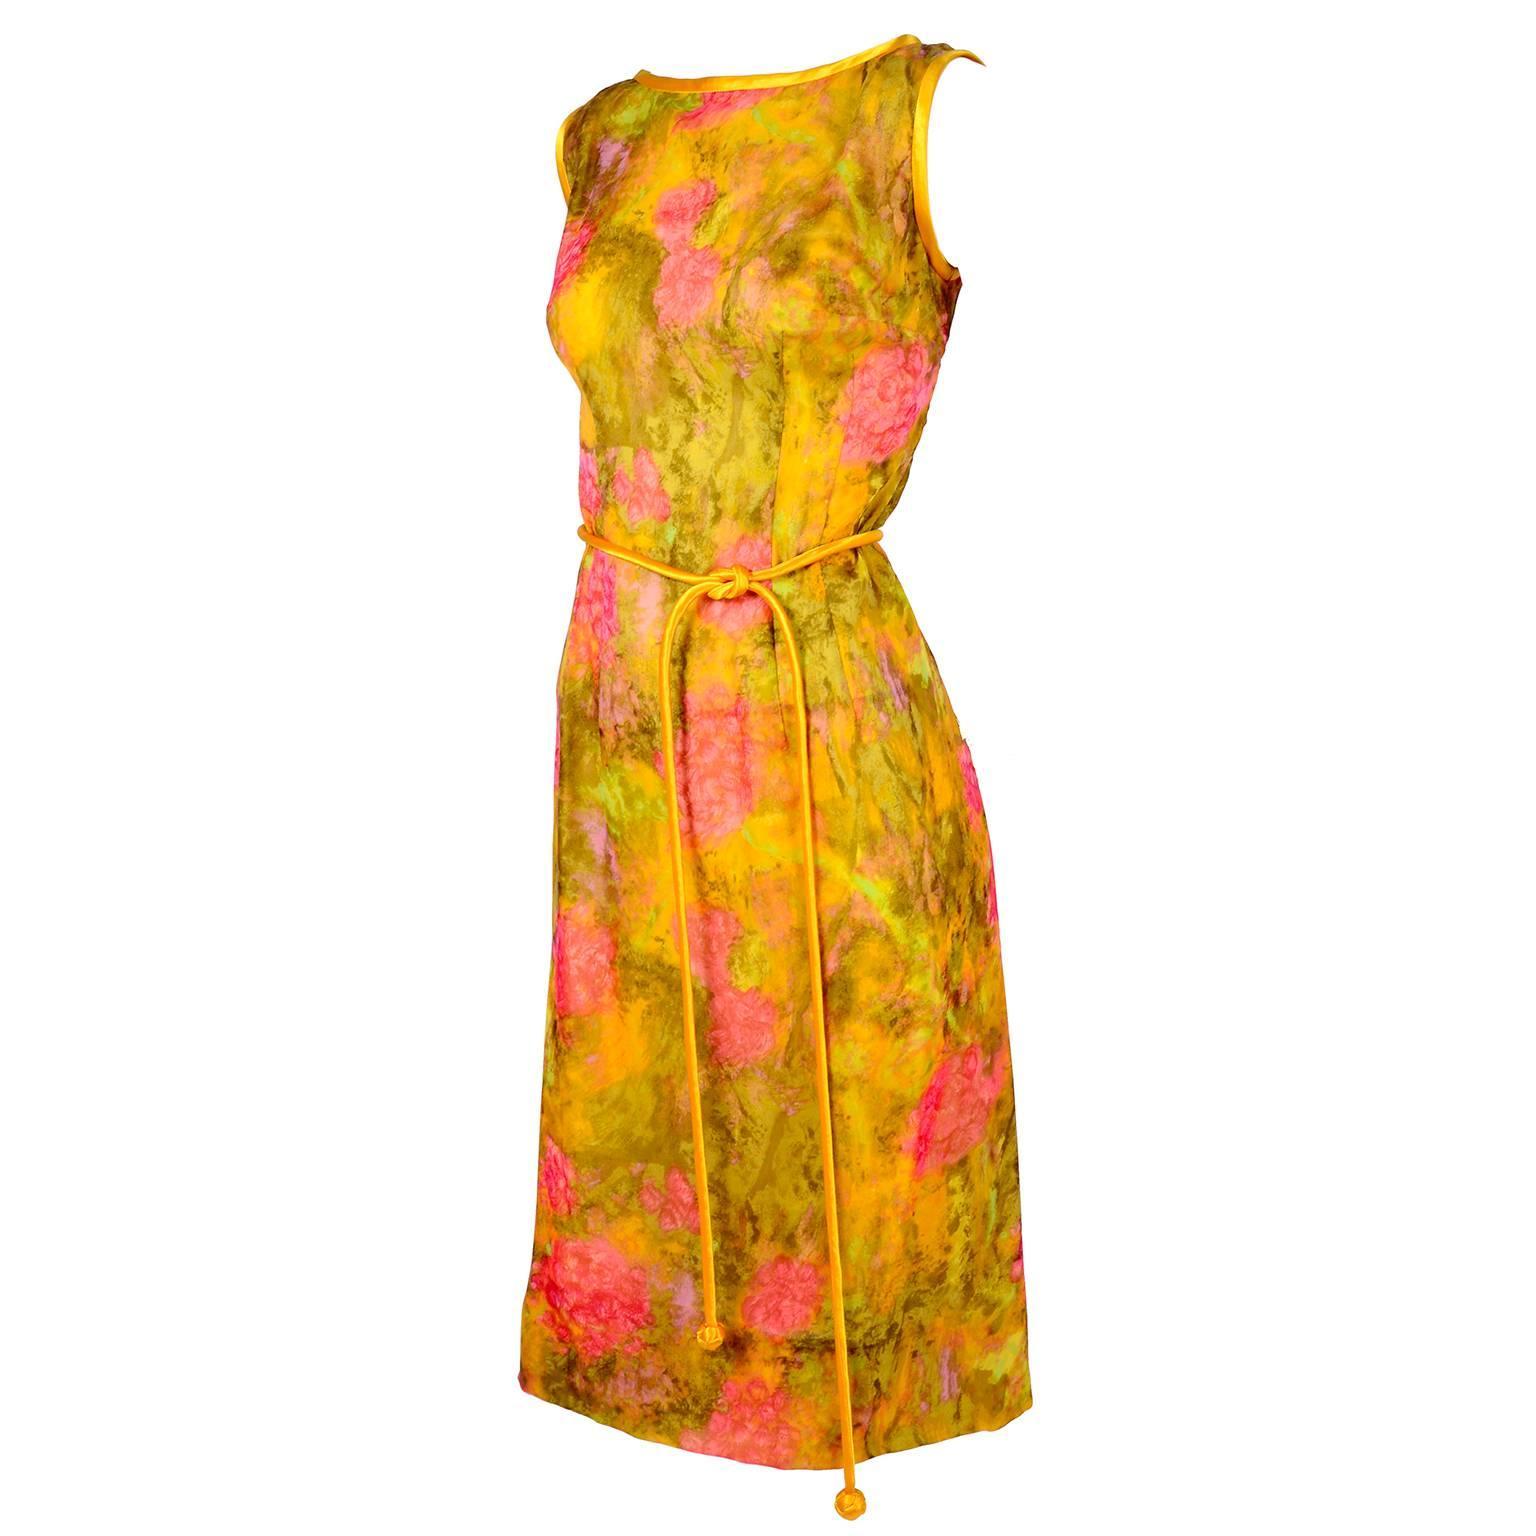 Sleeveless 1960s Dress by Gene Kristeller in Pink, Yellow & Green Floral Silk